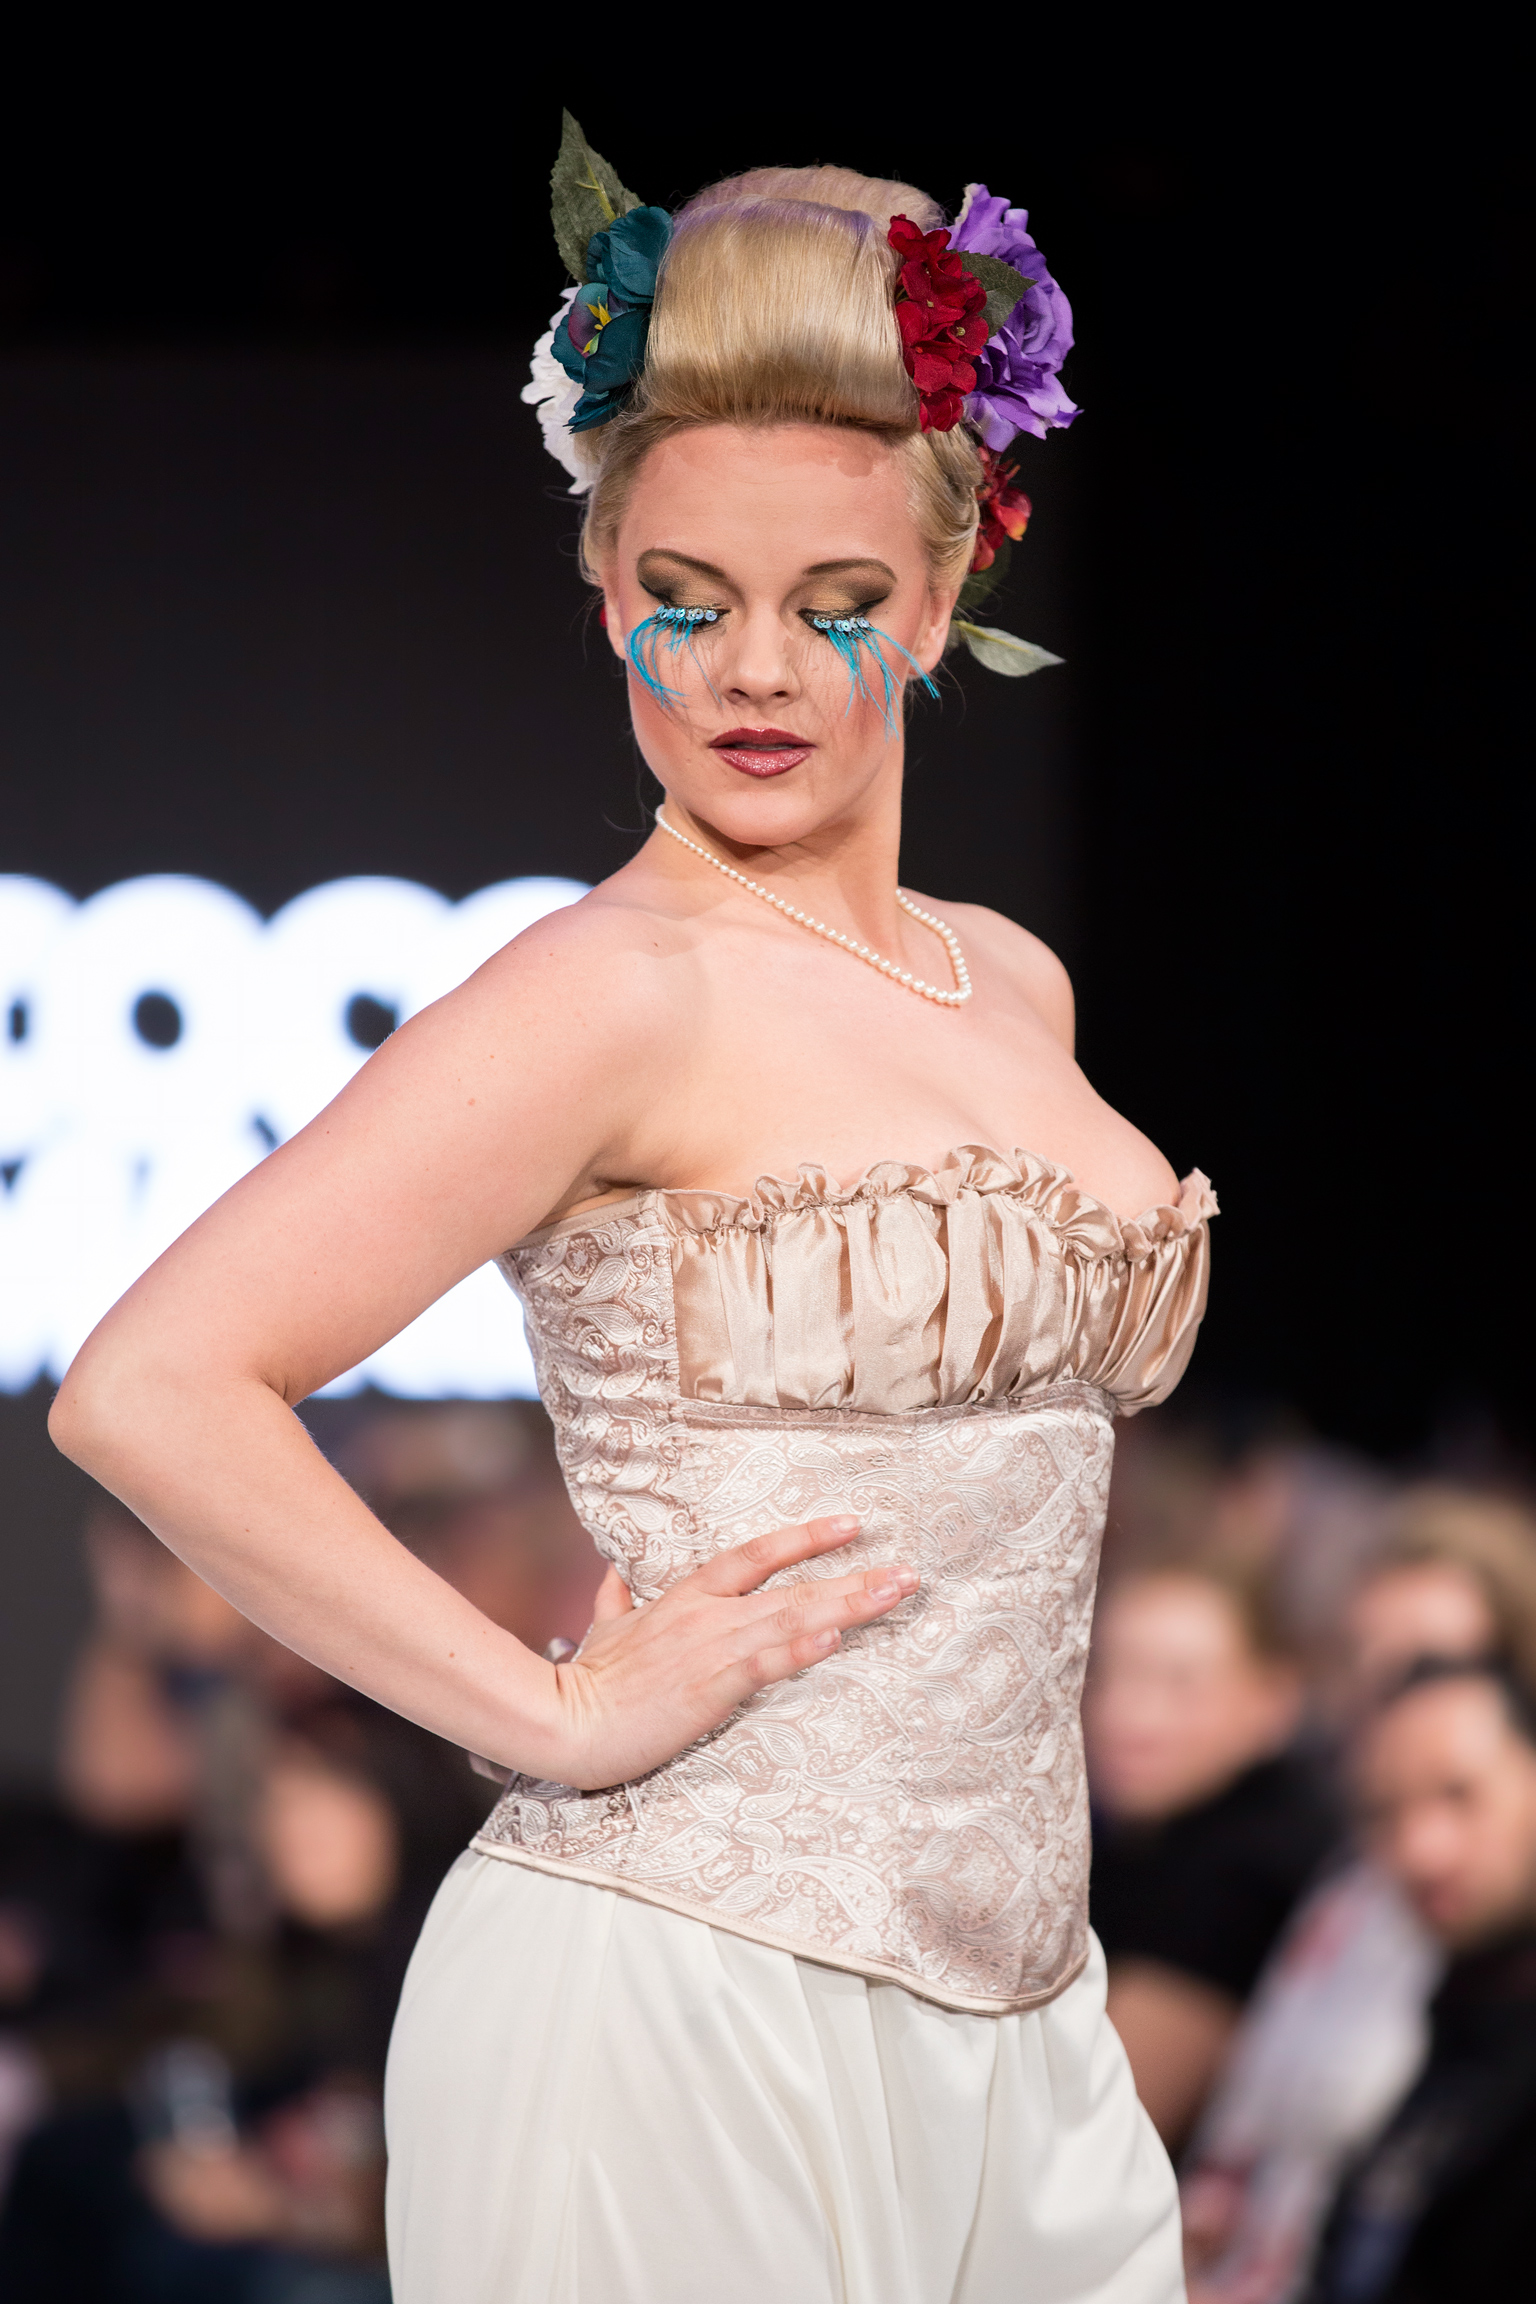 Denver-Fashion-Week-Day-4-_-Coco-Marie---003.jpg